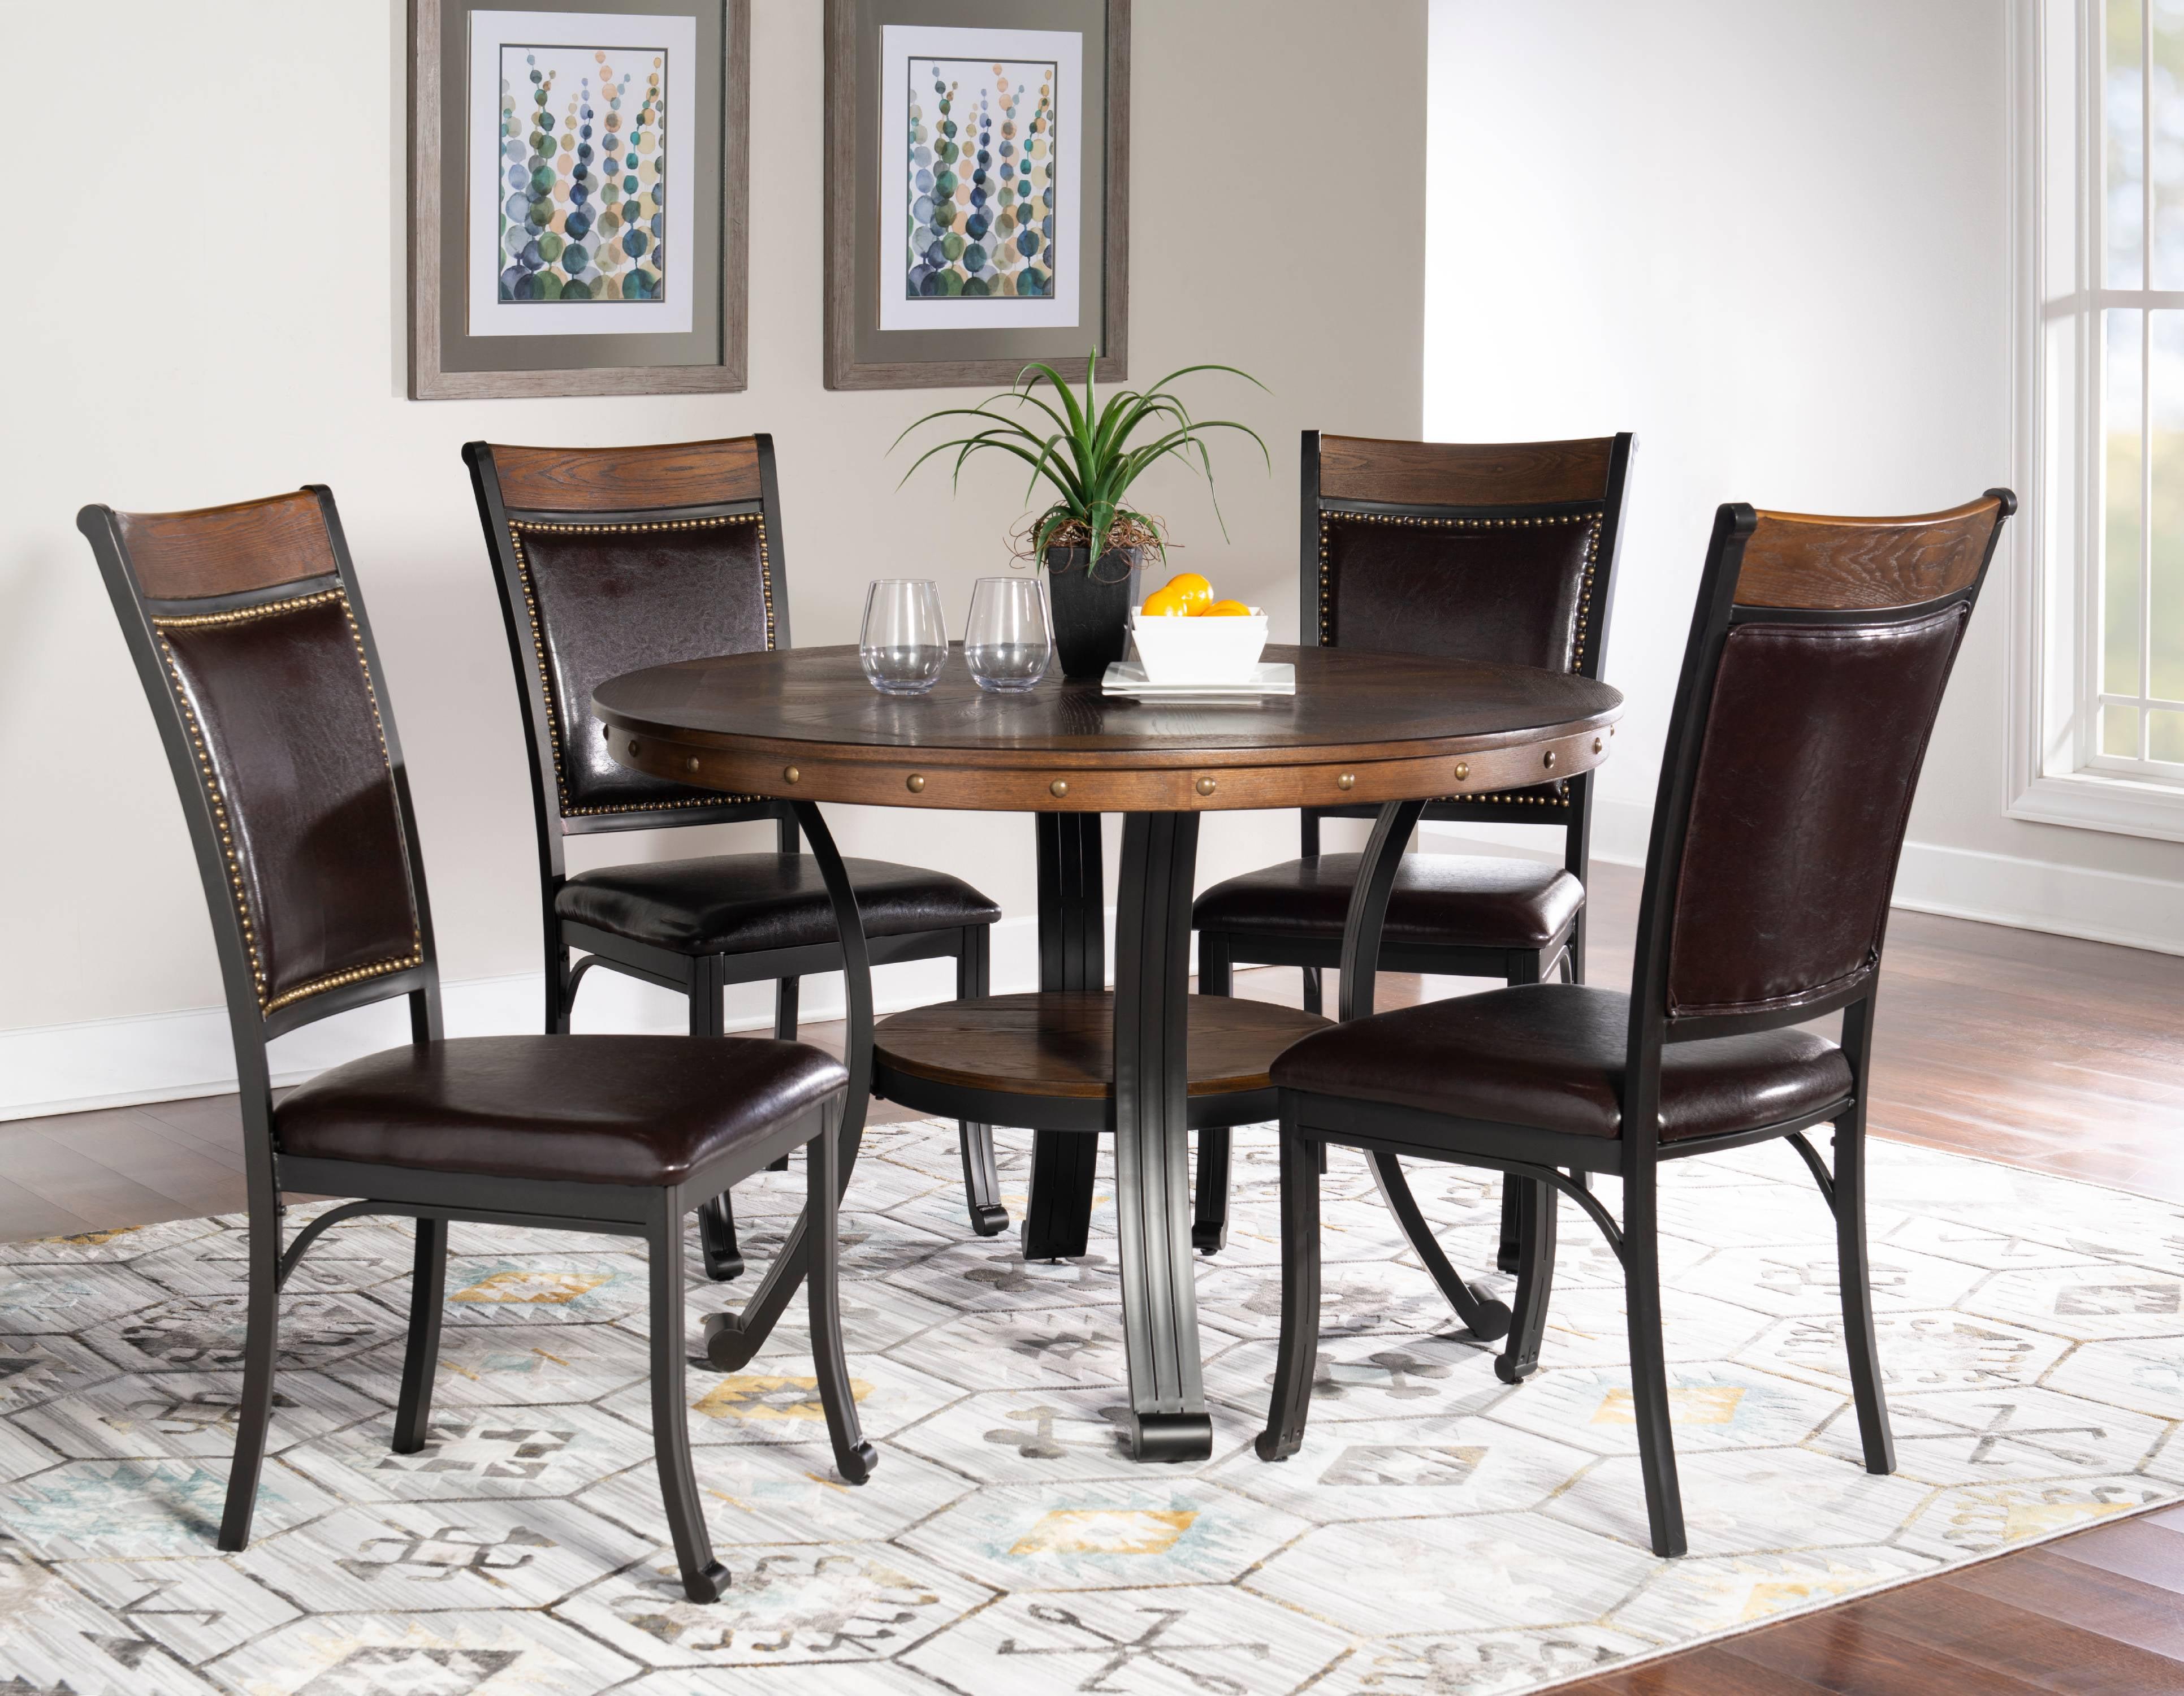 Powell Franklin 5 Piece Dining Table Set, Dark Brown - Walmart.com